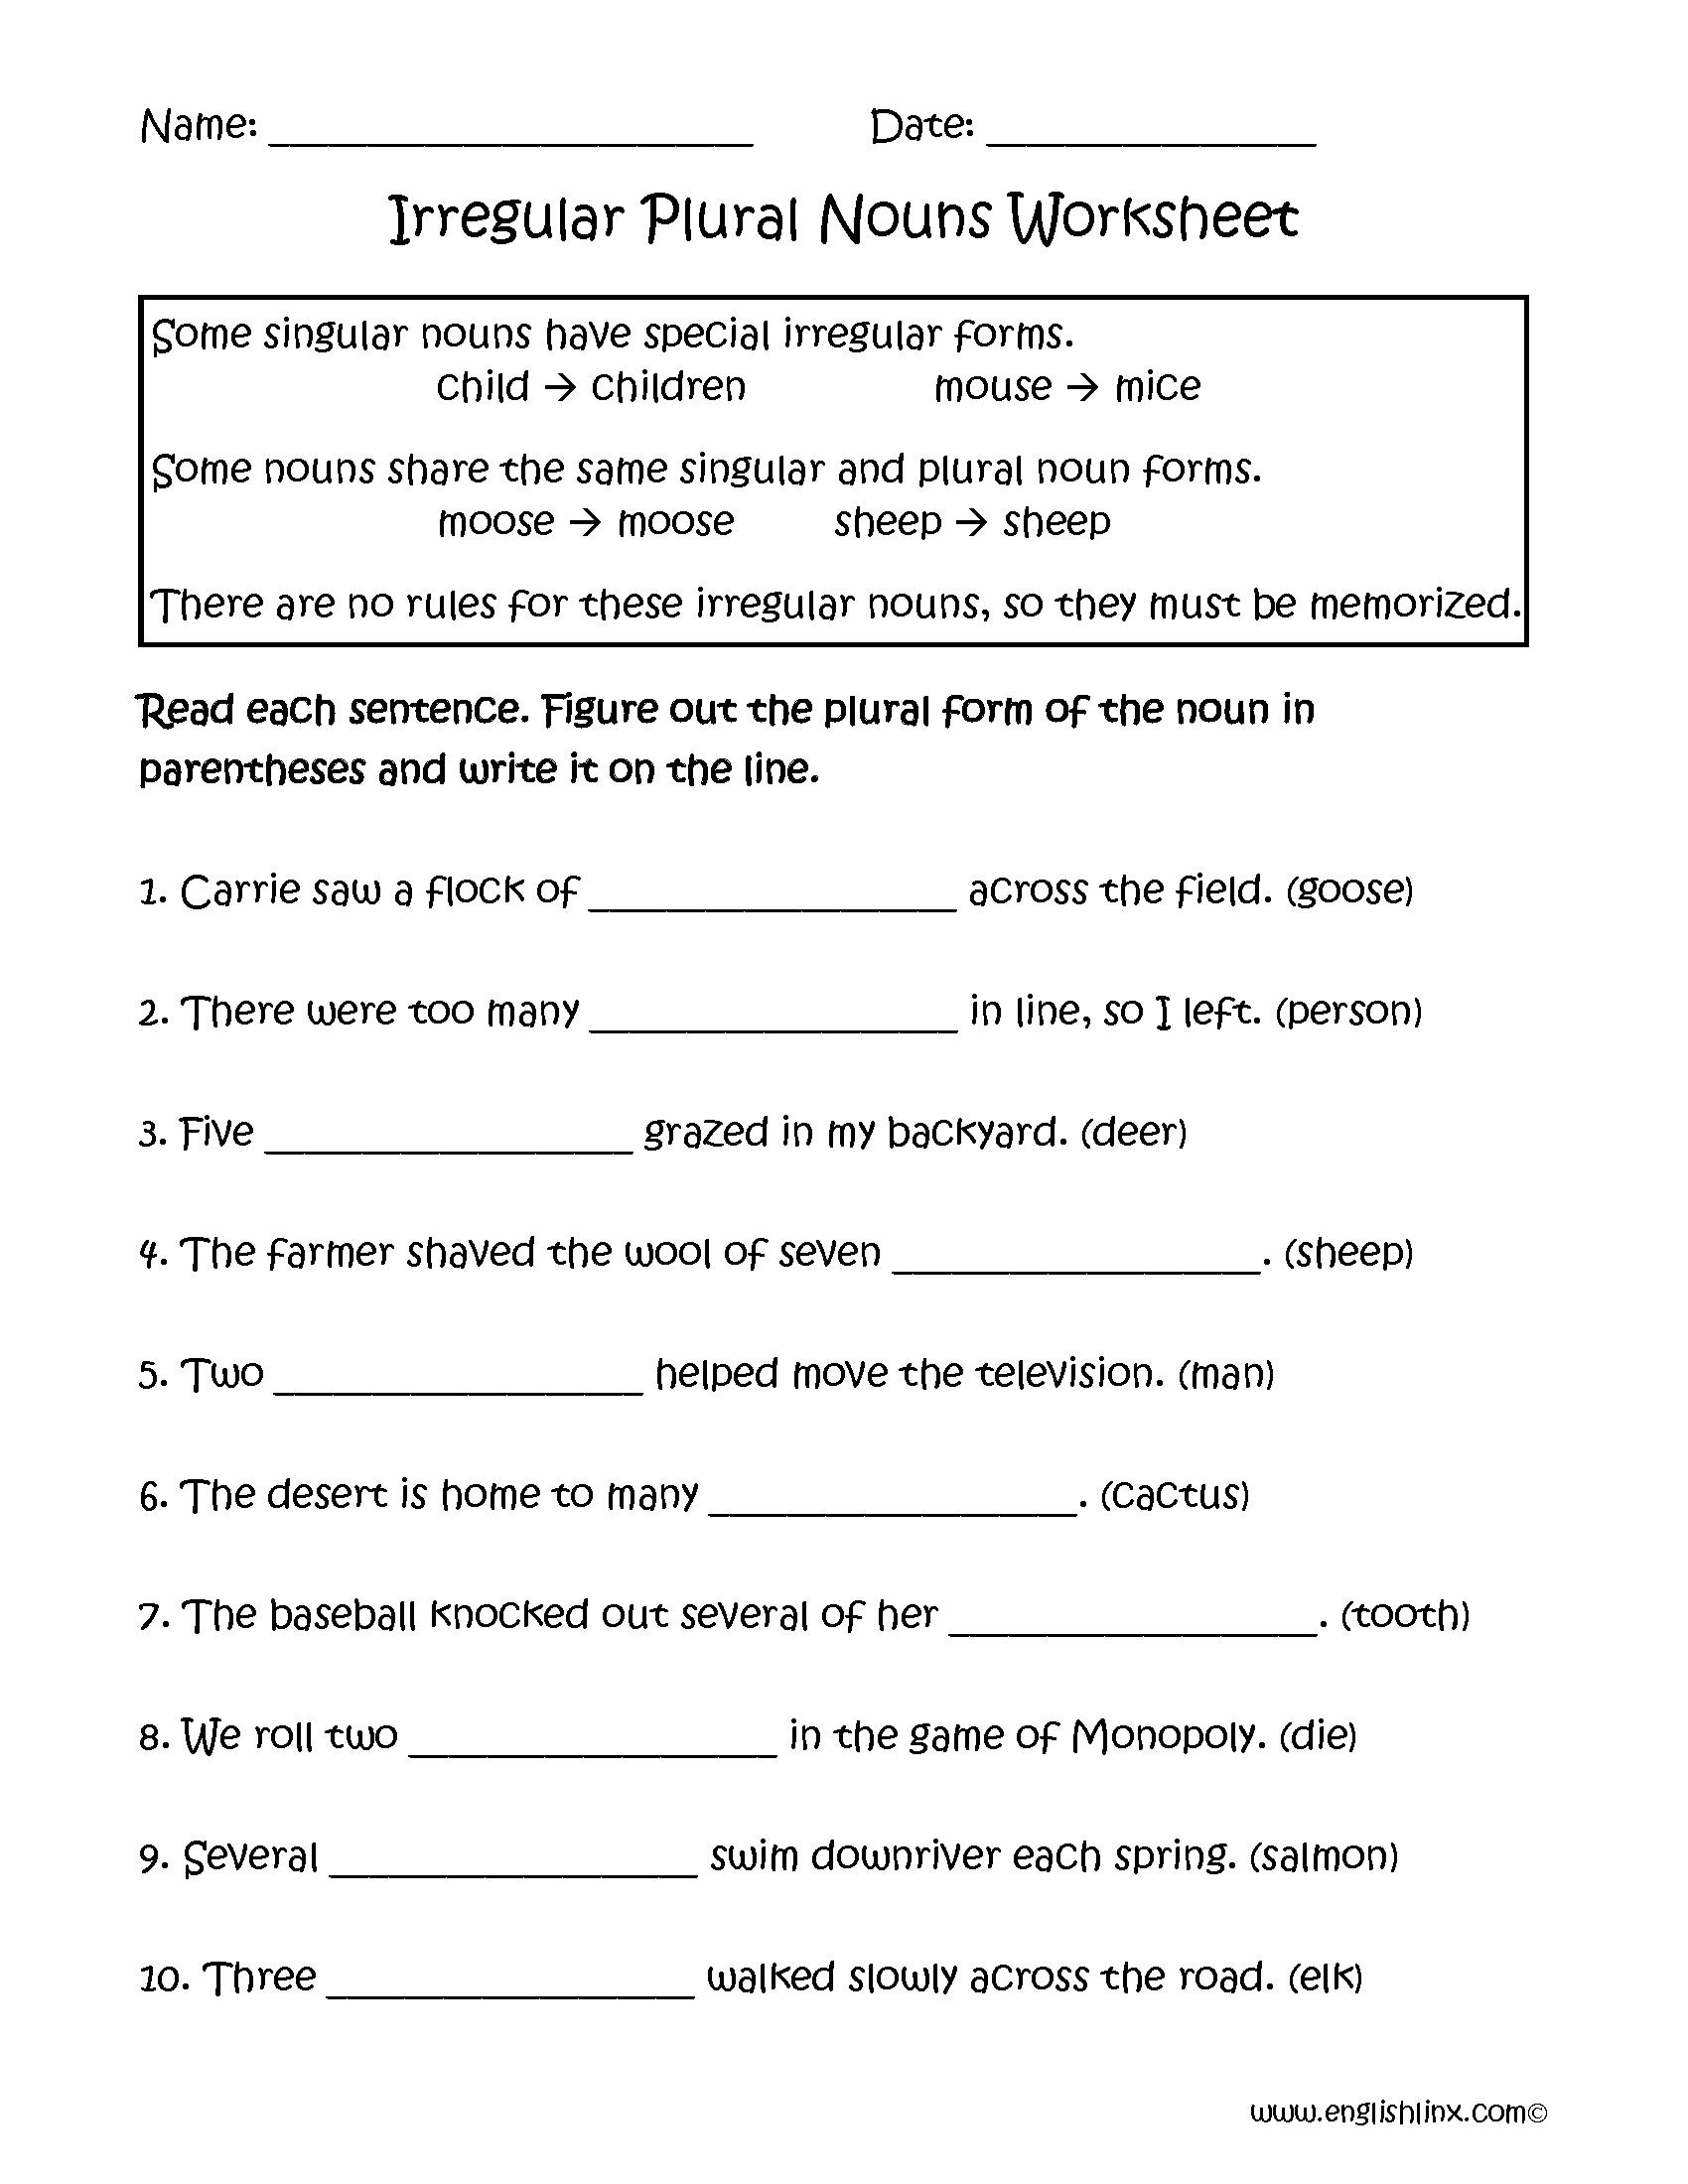 Irregular Plural Nouns Worksheets